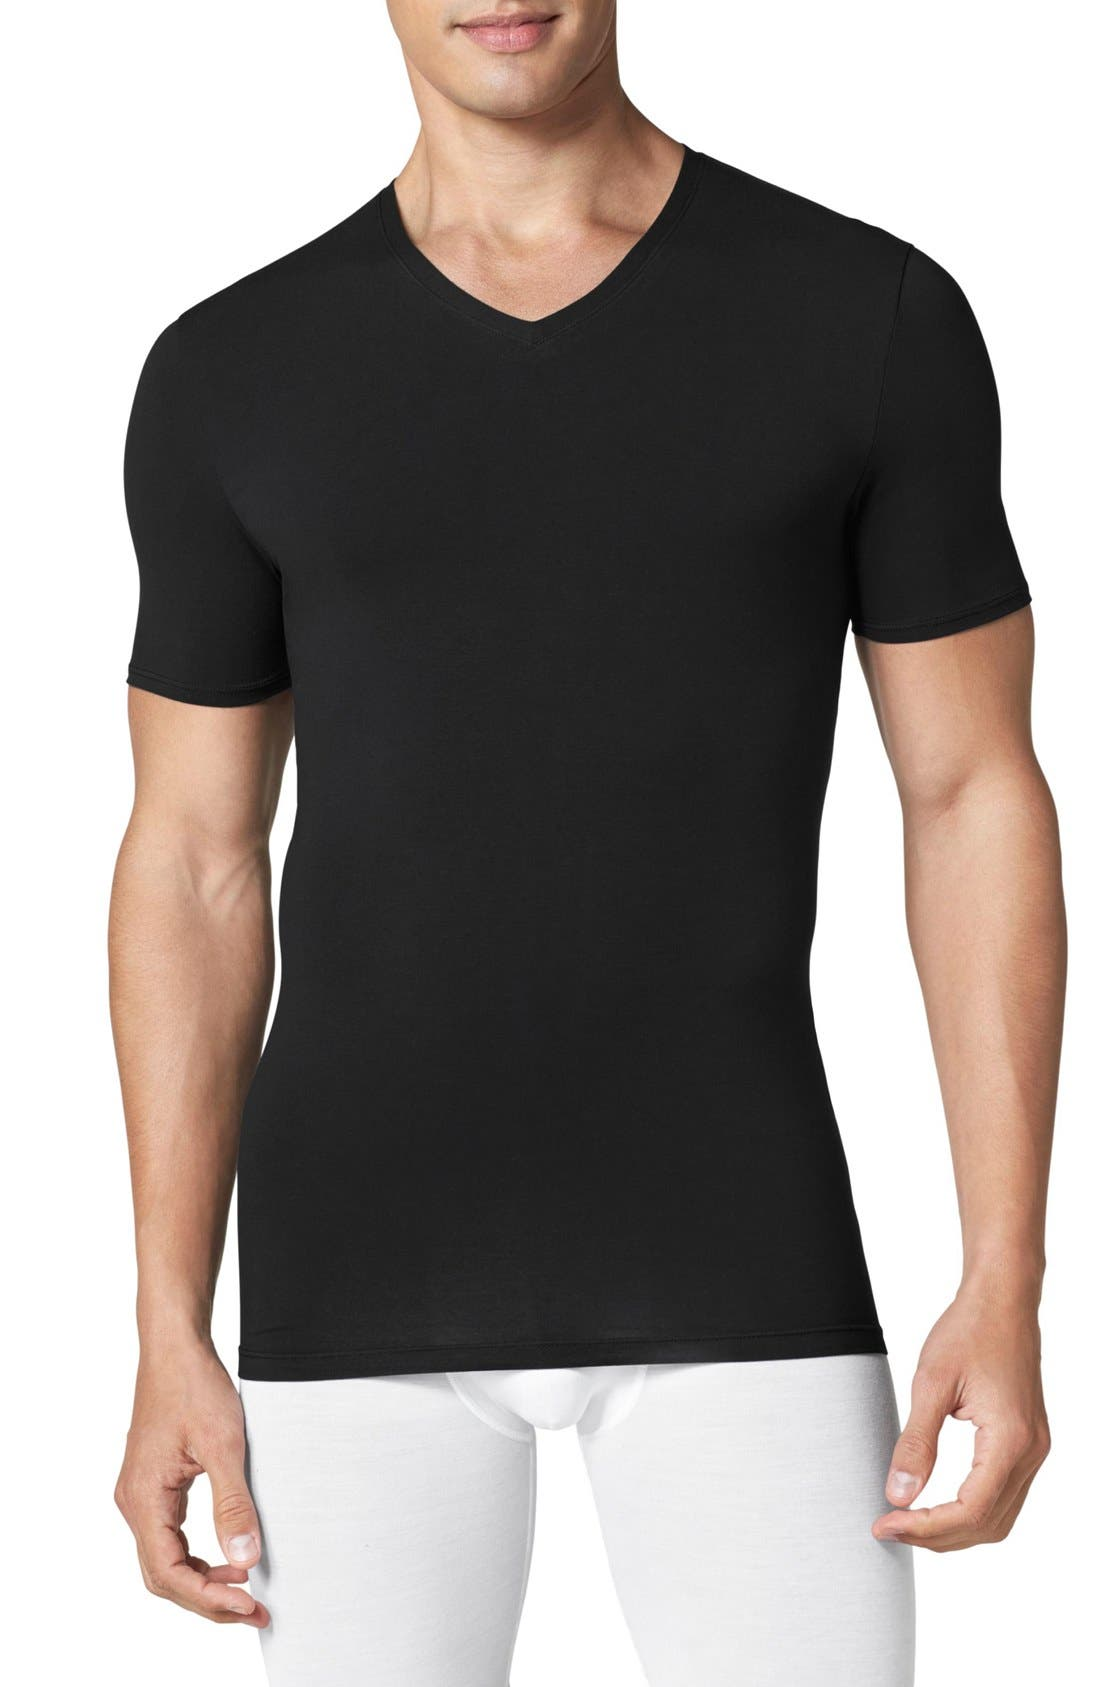 Main Image - Tommy John 'Cool Cotton' High V-Neck Undershirt